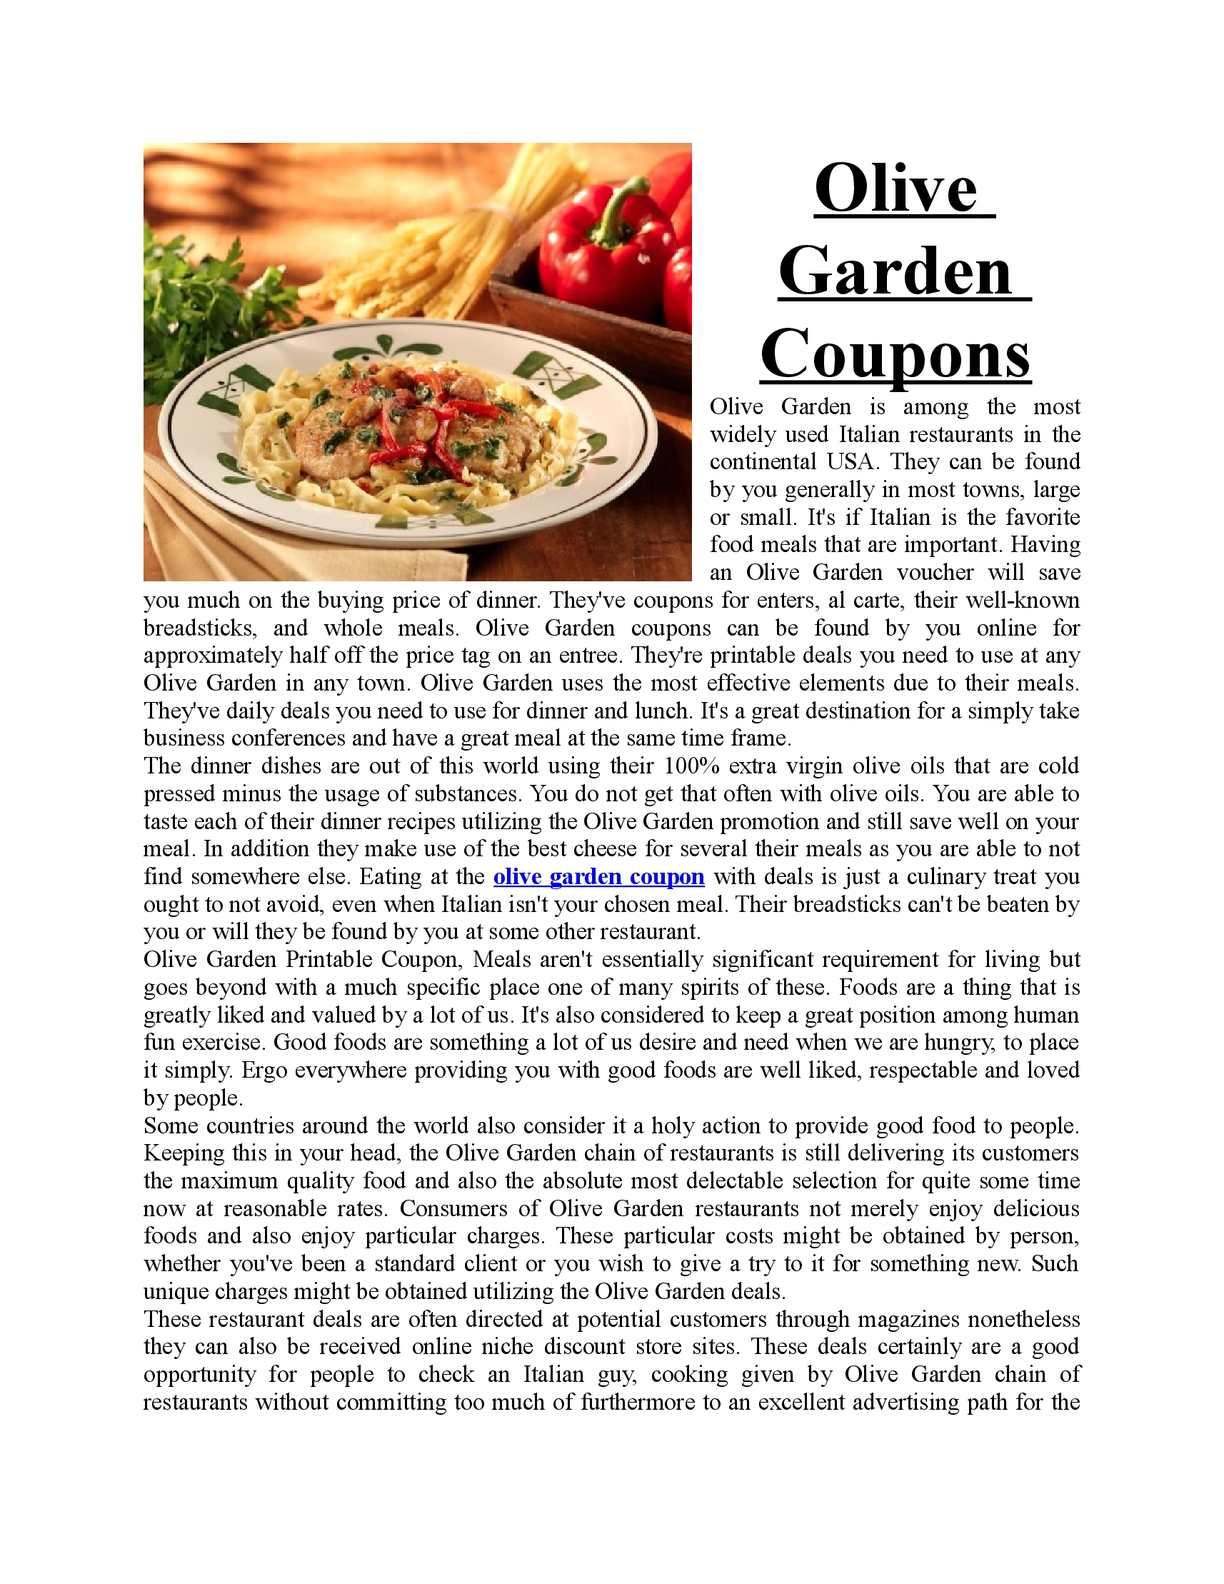 image regarding Olive Garden Printable Coupons known as Calaméo - print olive back garden discount codes